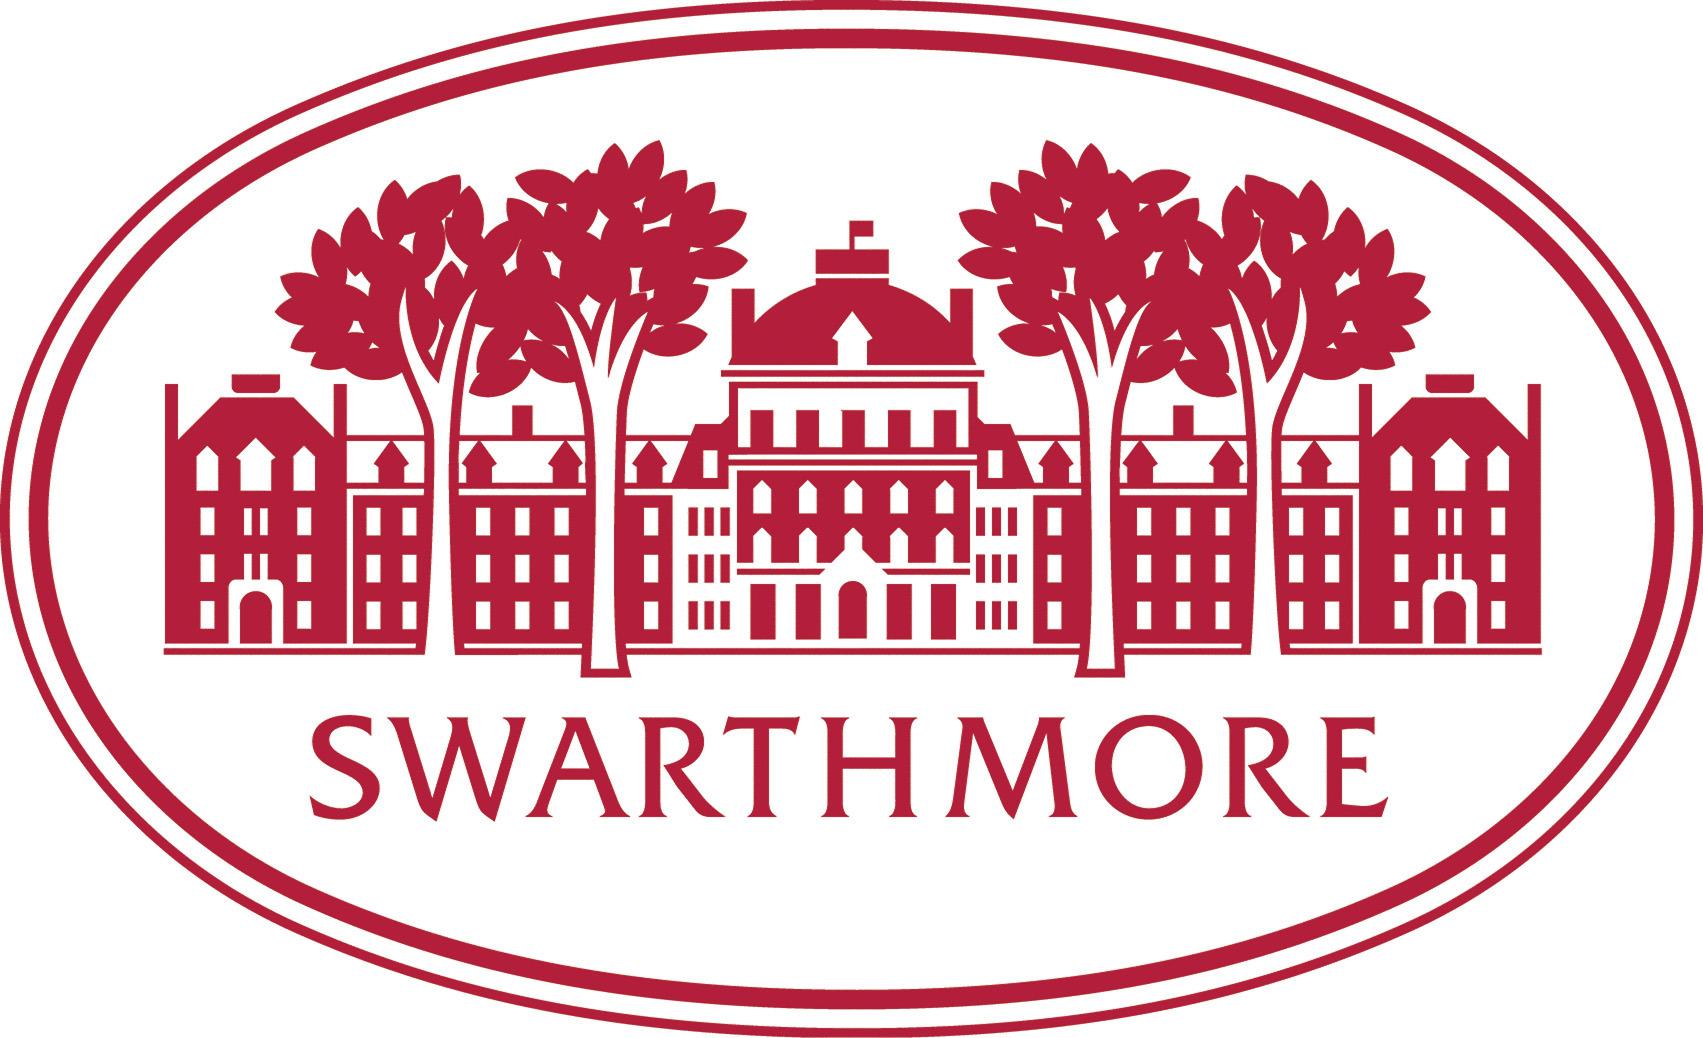 Swarthmore College: Discover Swarthmore